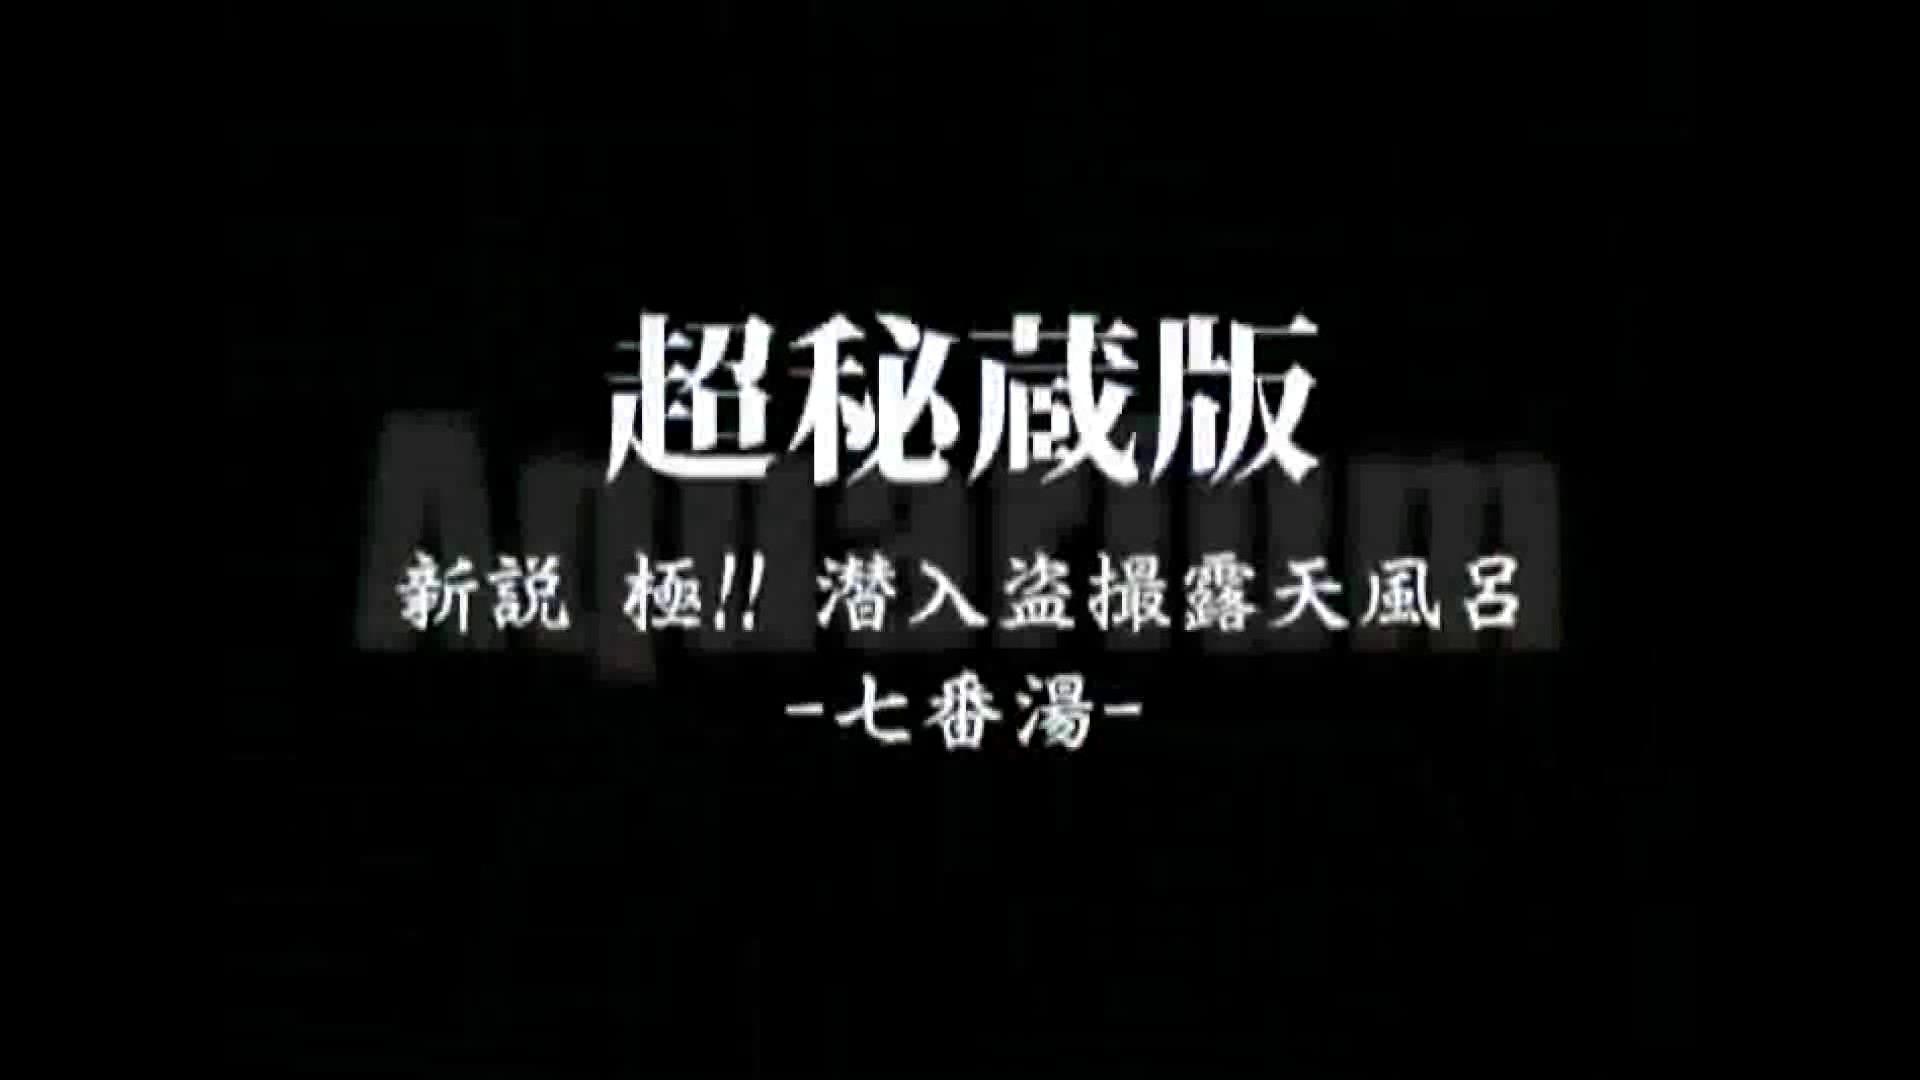 Aquaな露天風呂Vol.871潜入盗撮露天風呂七判湯 其の五 露天 | 潜入シリーズ  68pic 1